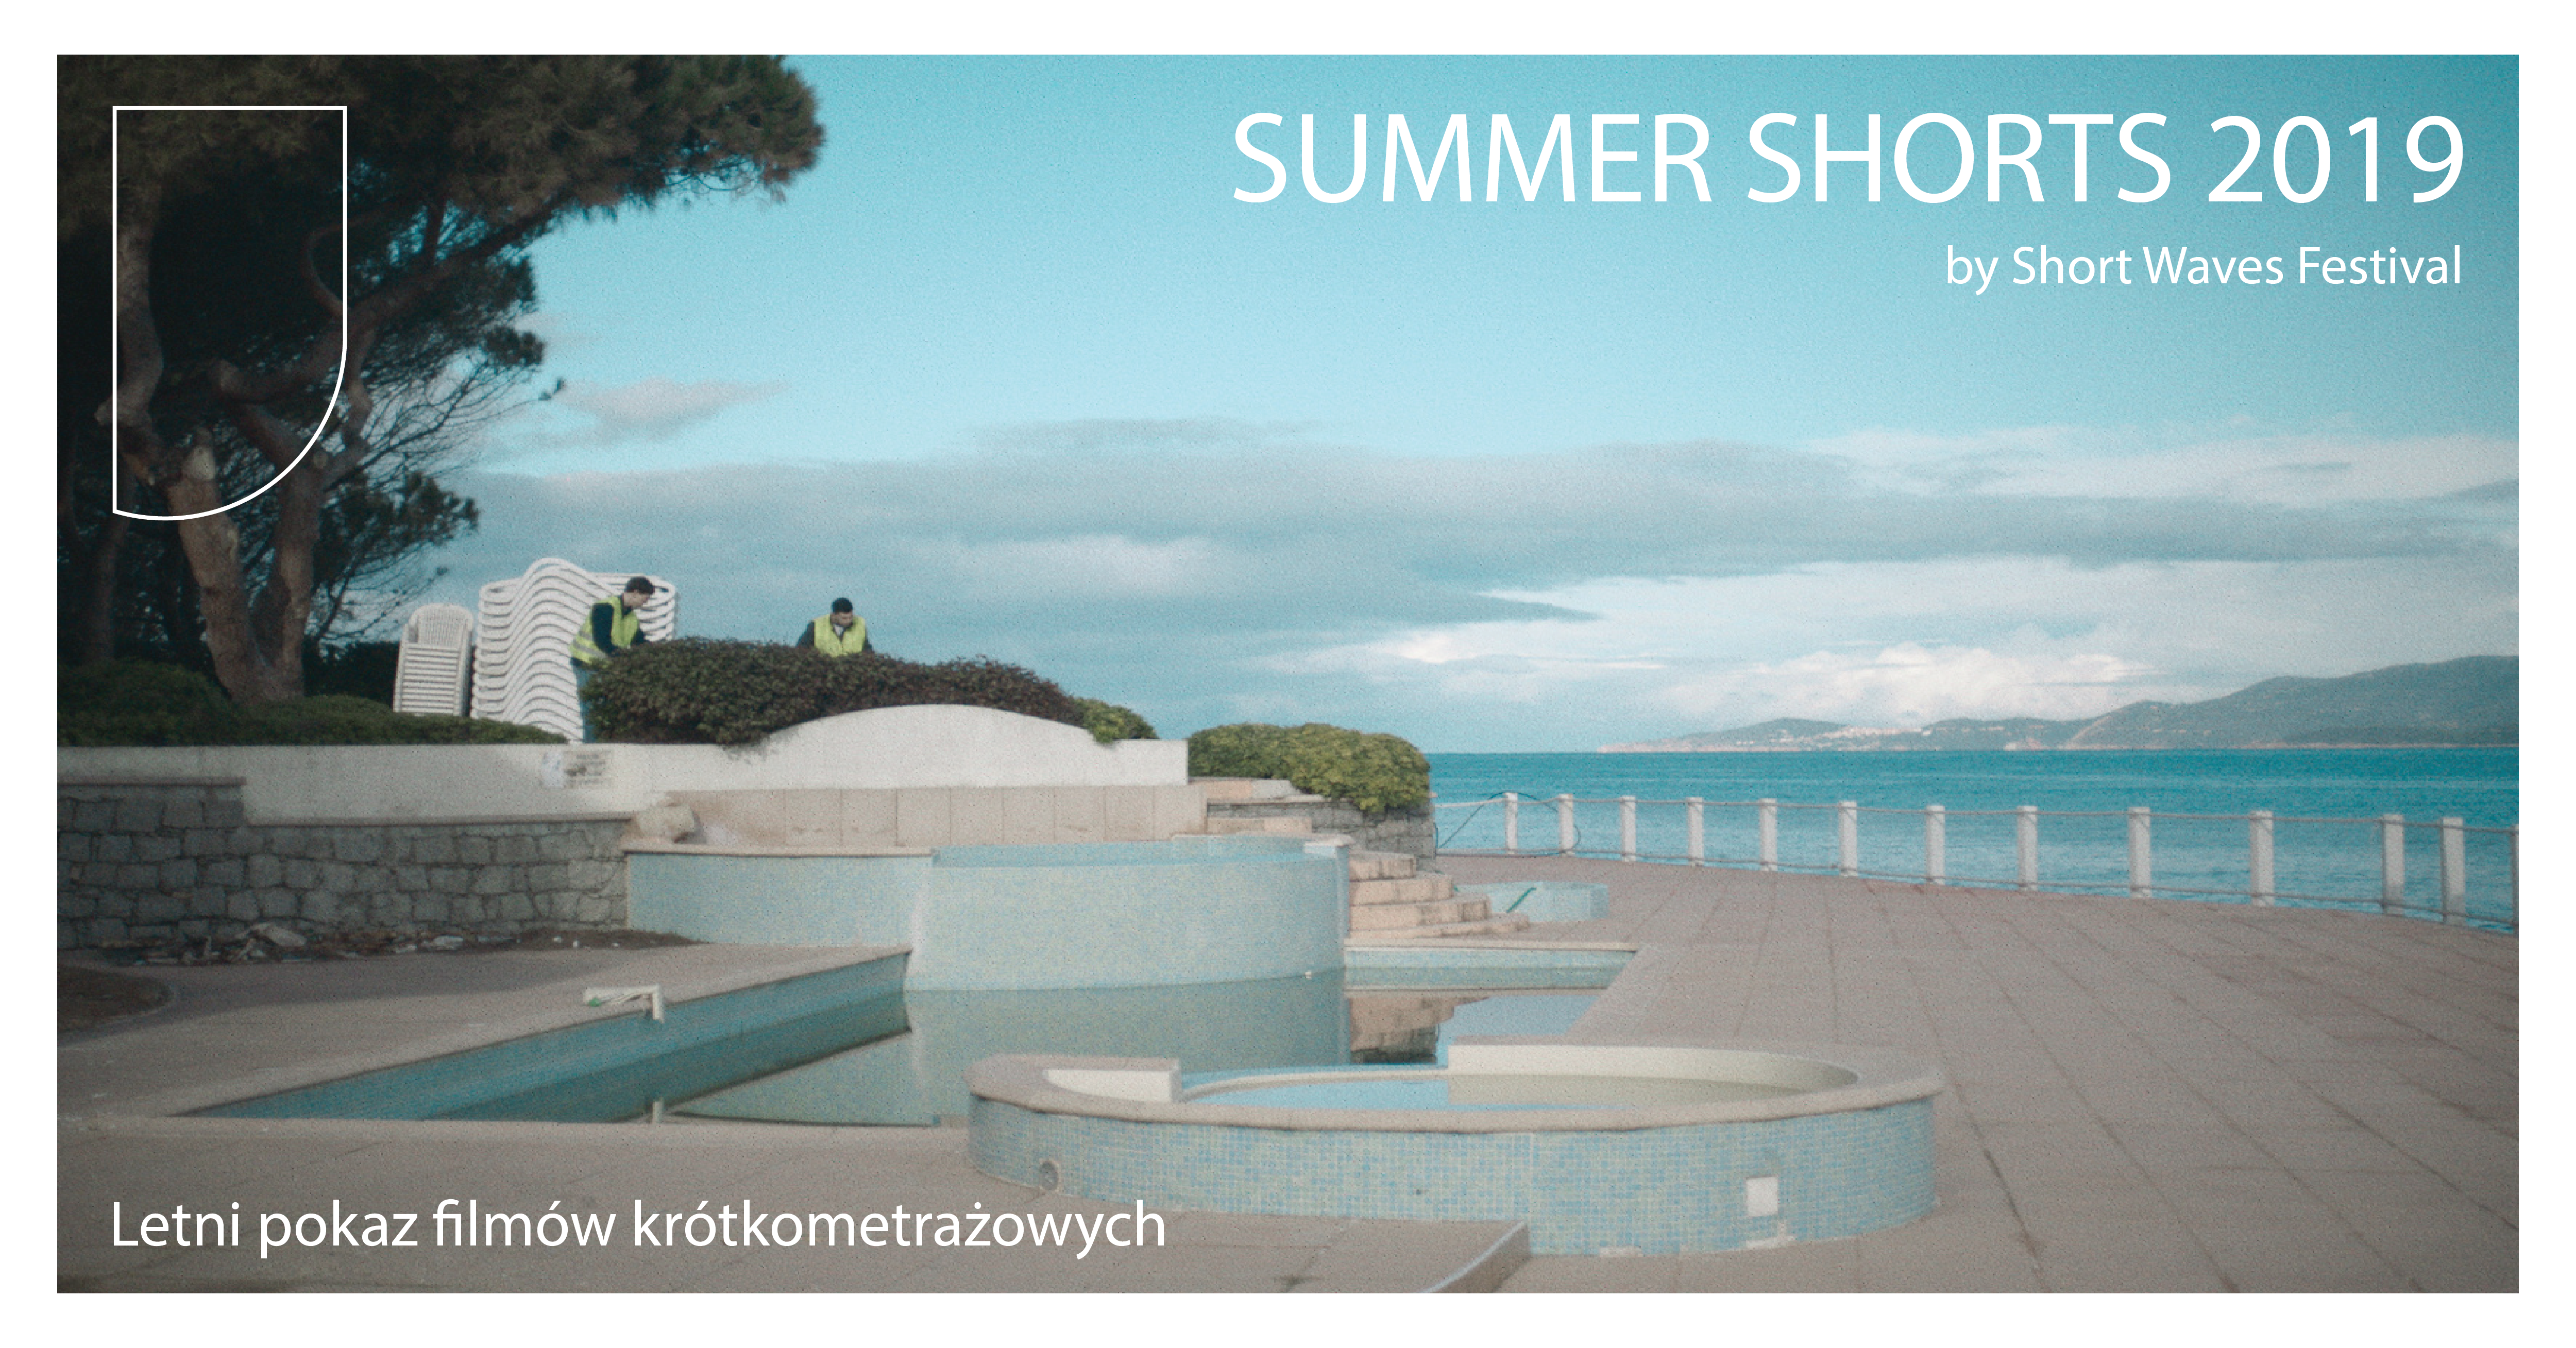 Summer Shorts 2019